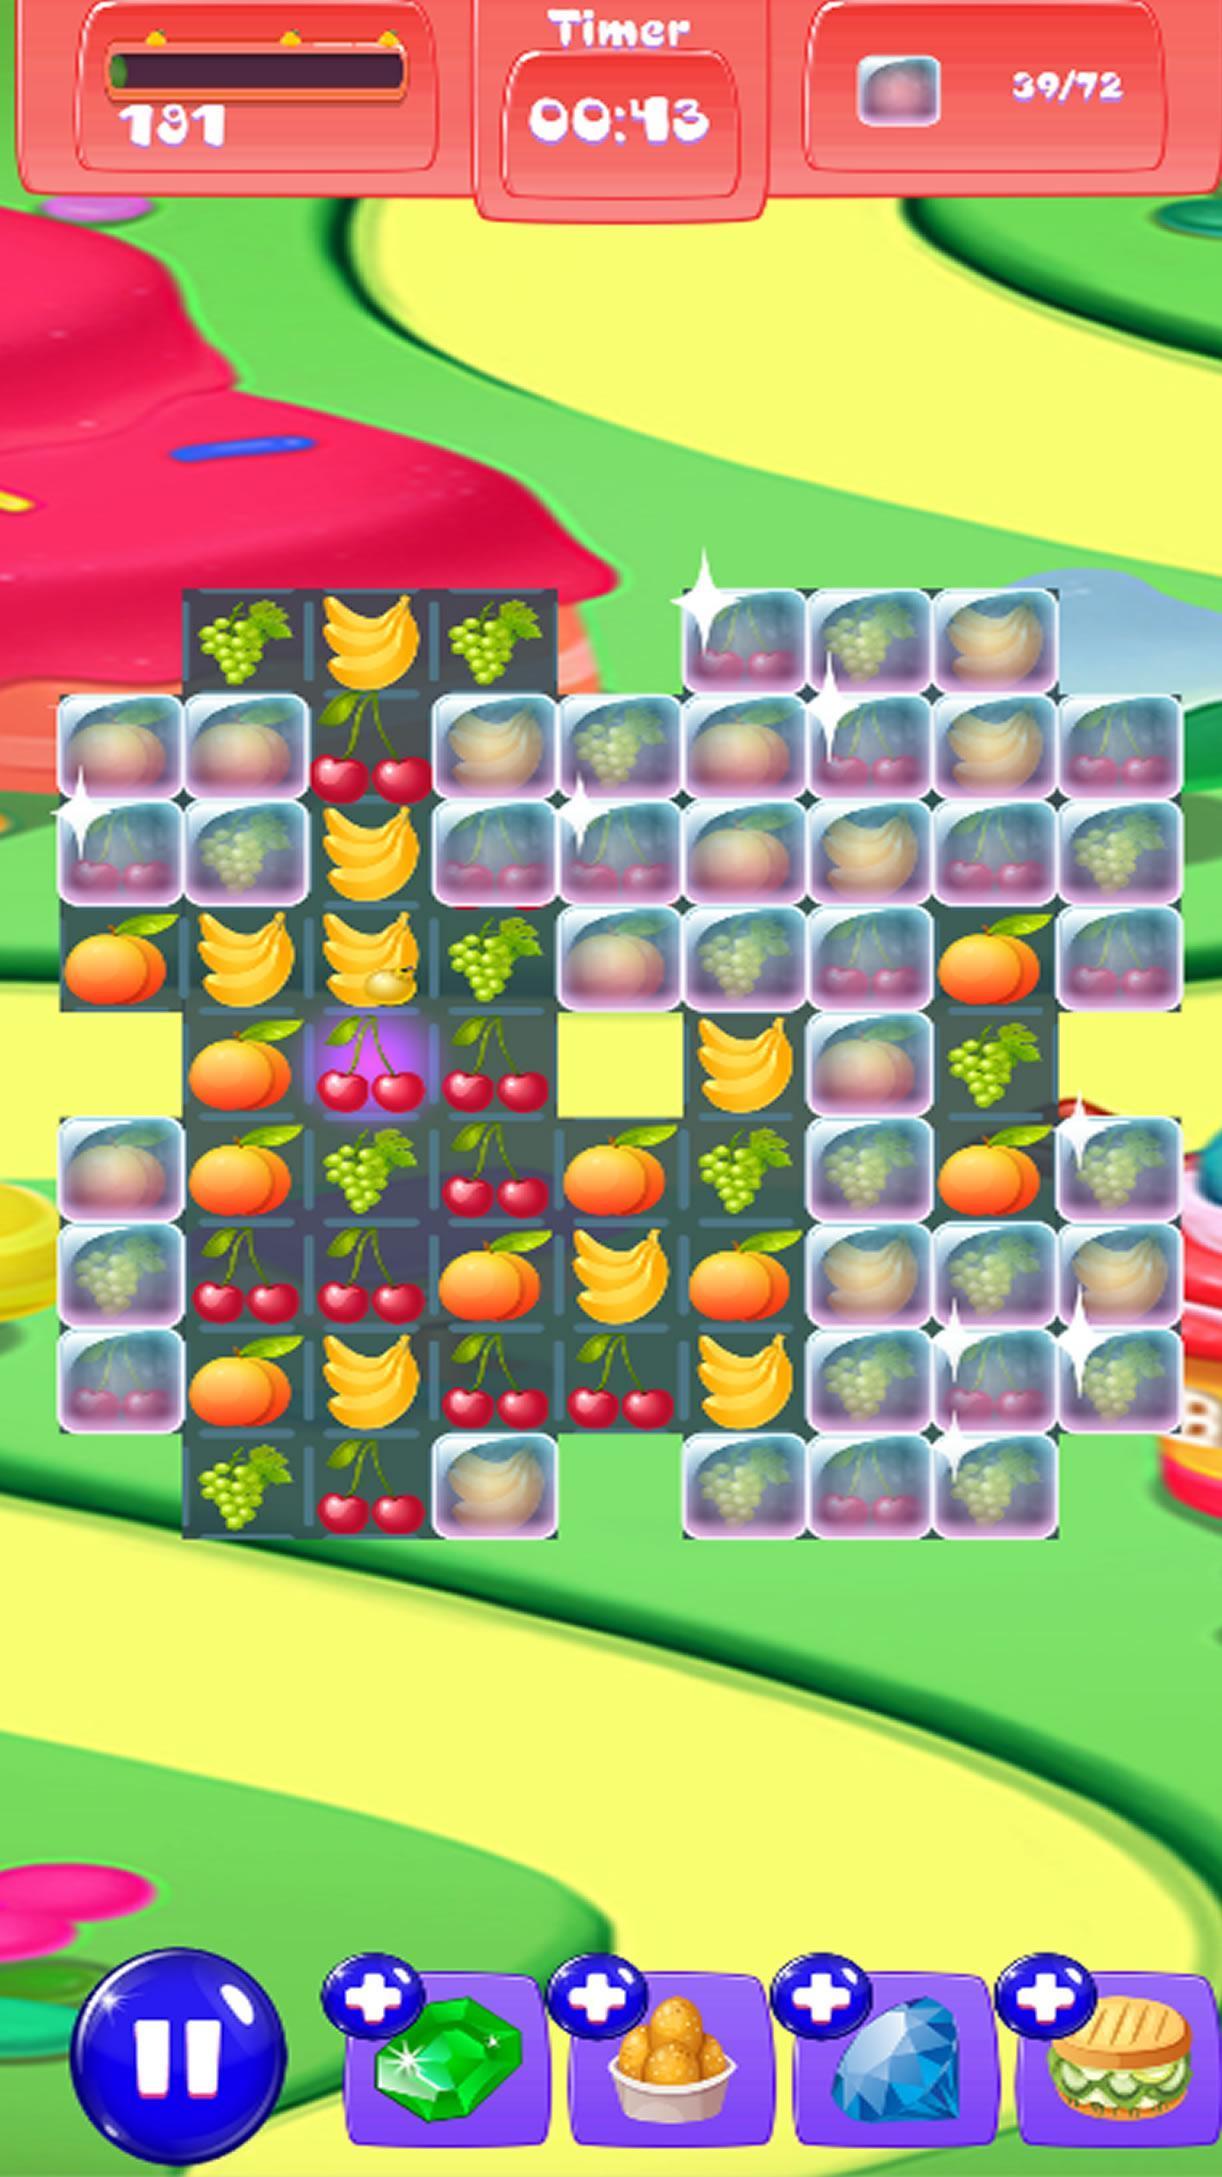 Fruit Splash Match Swipe 1.0 Screenshot 5